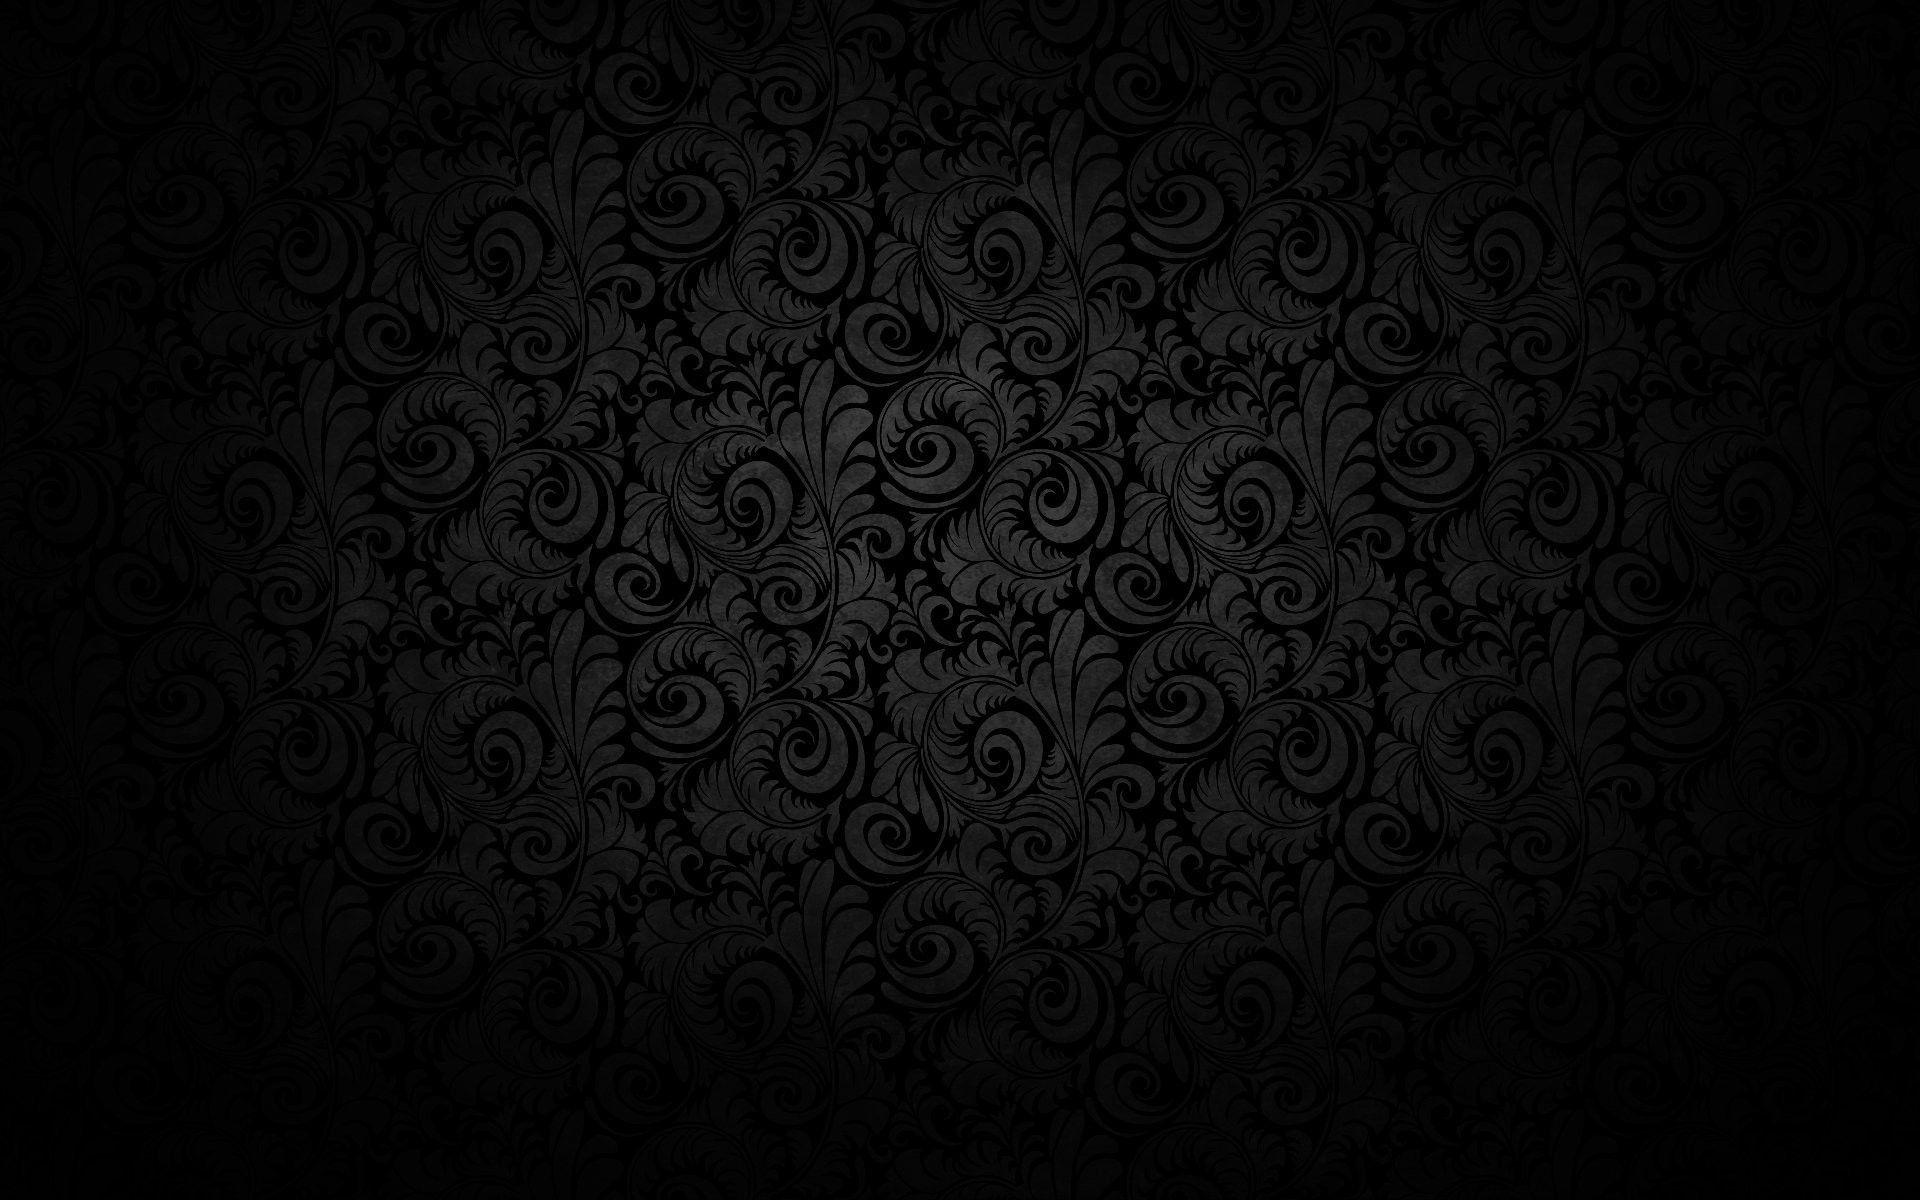 Brushed Aluminum Wallpapers 1920x1200